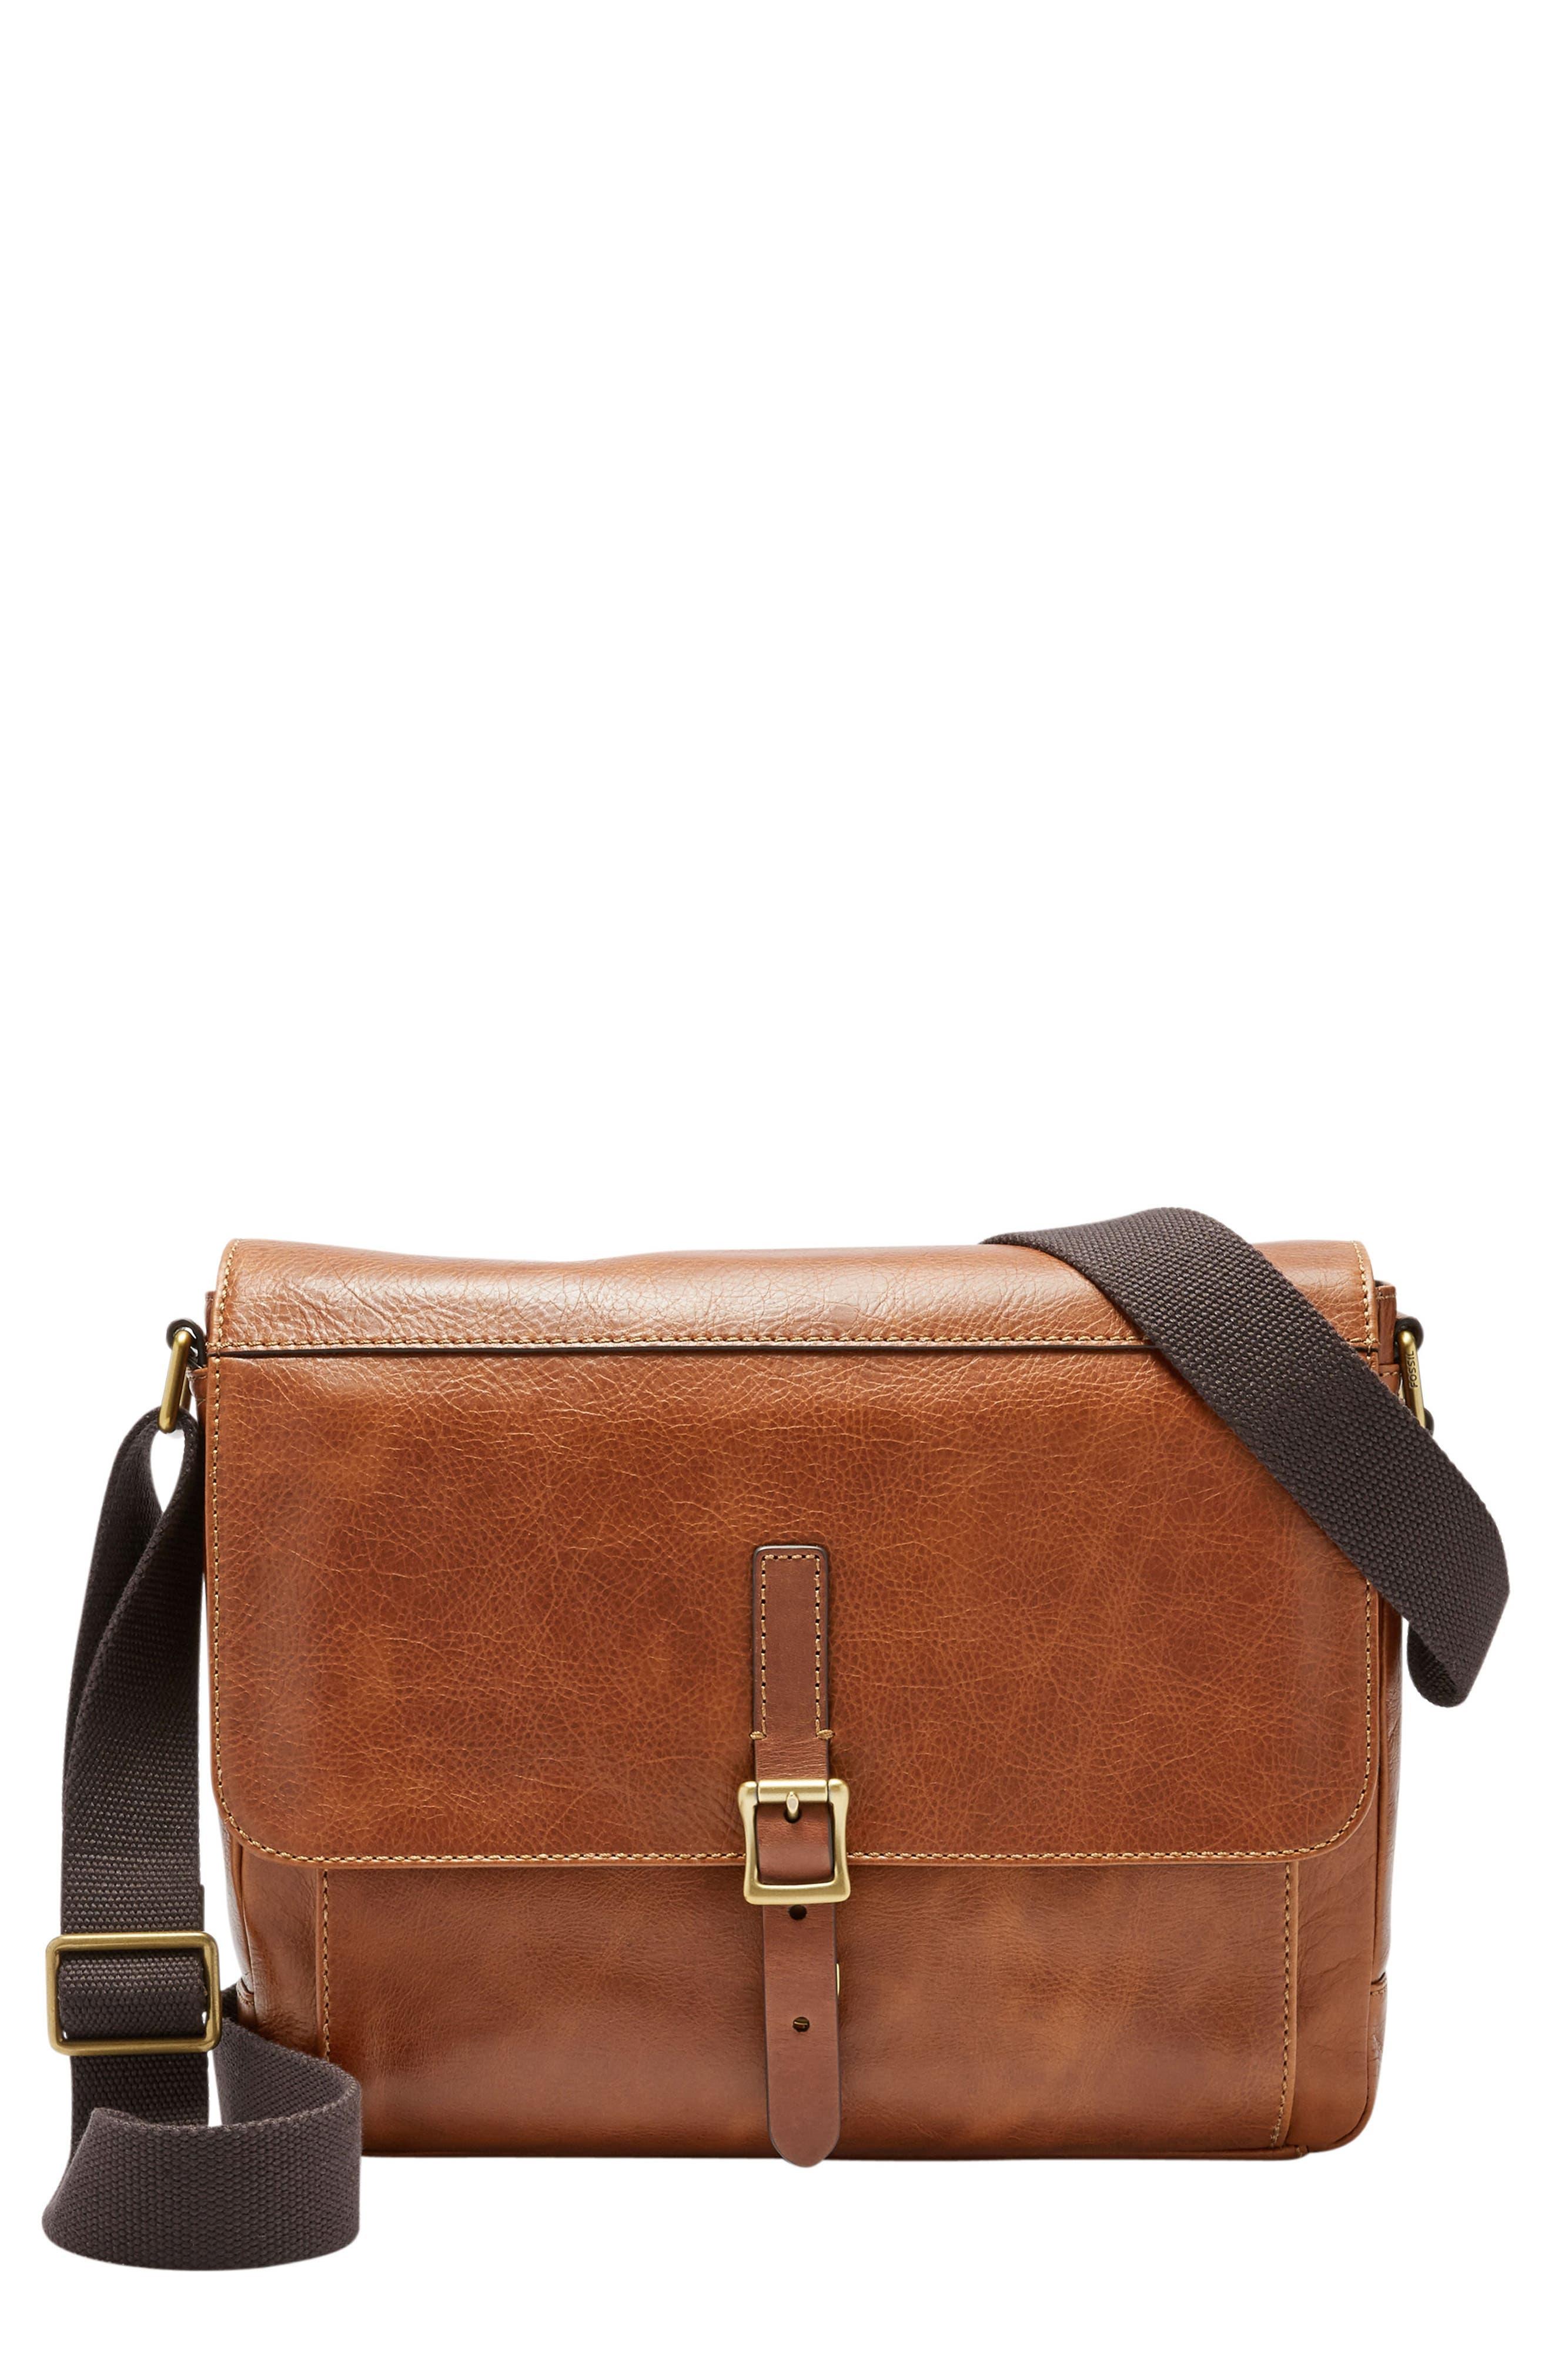 Defender Leather Messenger Bag,                             Main thumbnail 1, color,                             202